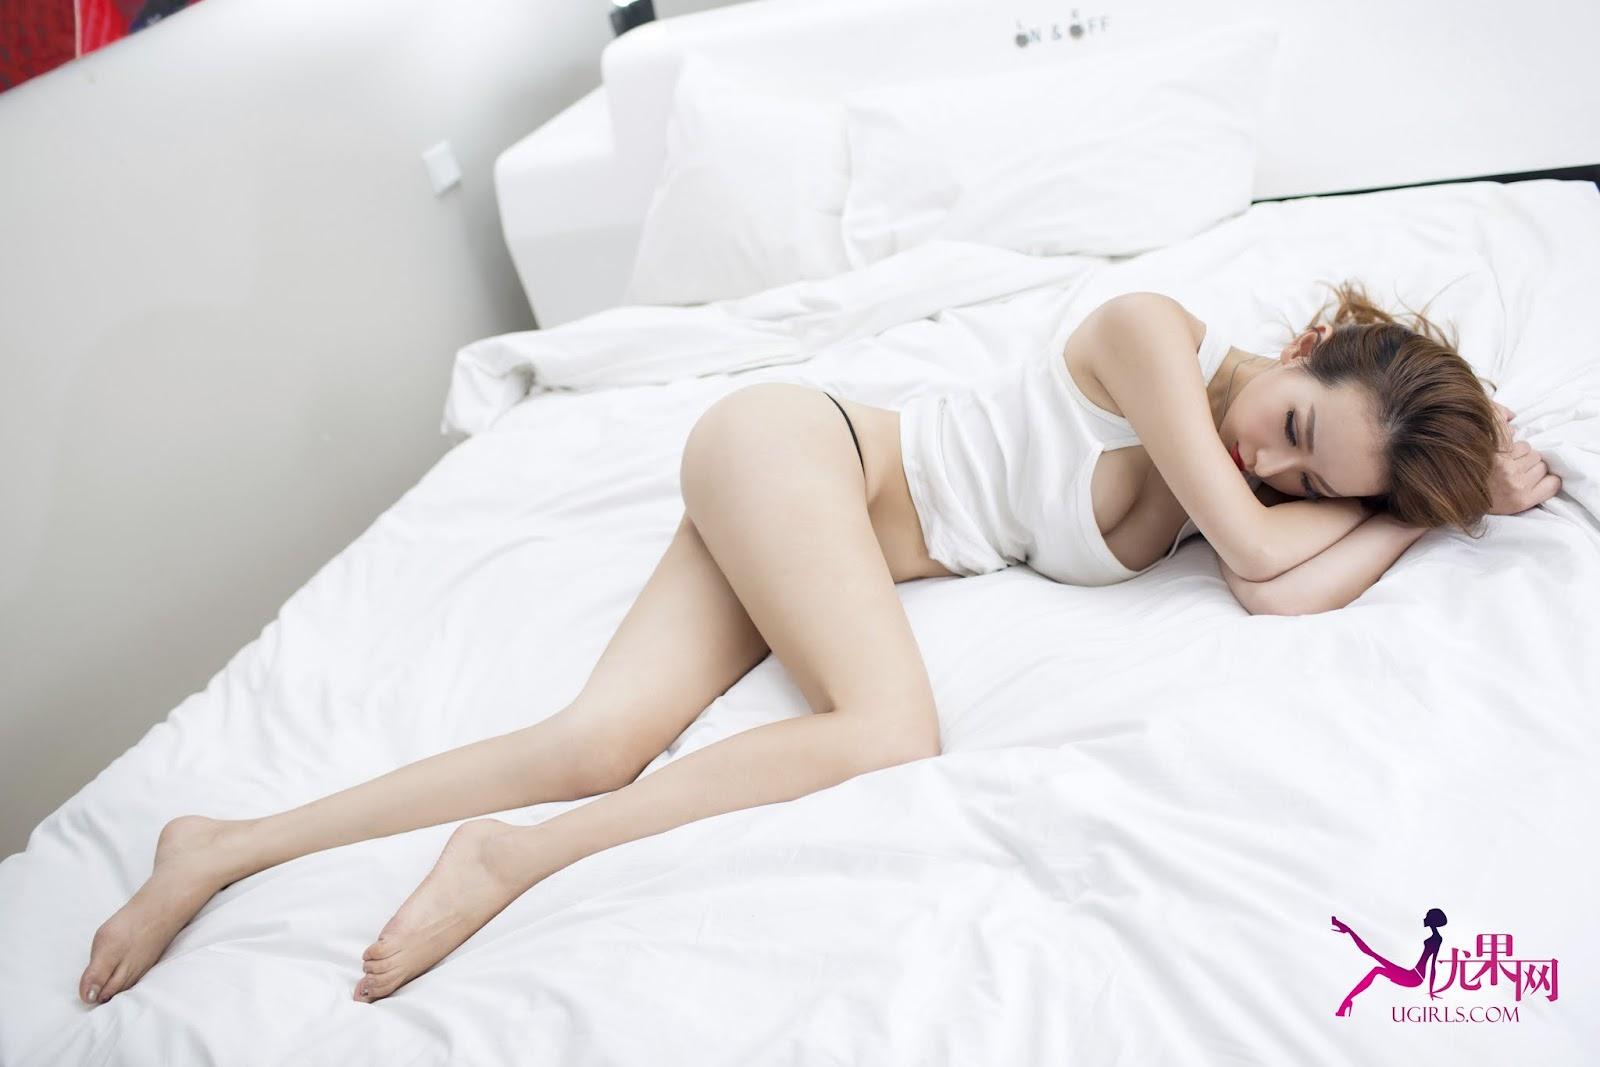 U091%2B%252856%2529 - Sexy Photo UGIRLS NO.91 Nude Girl